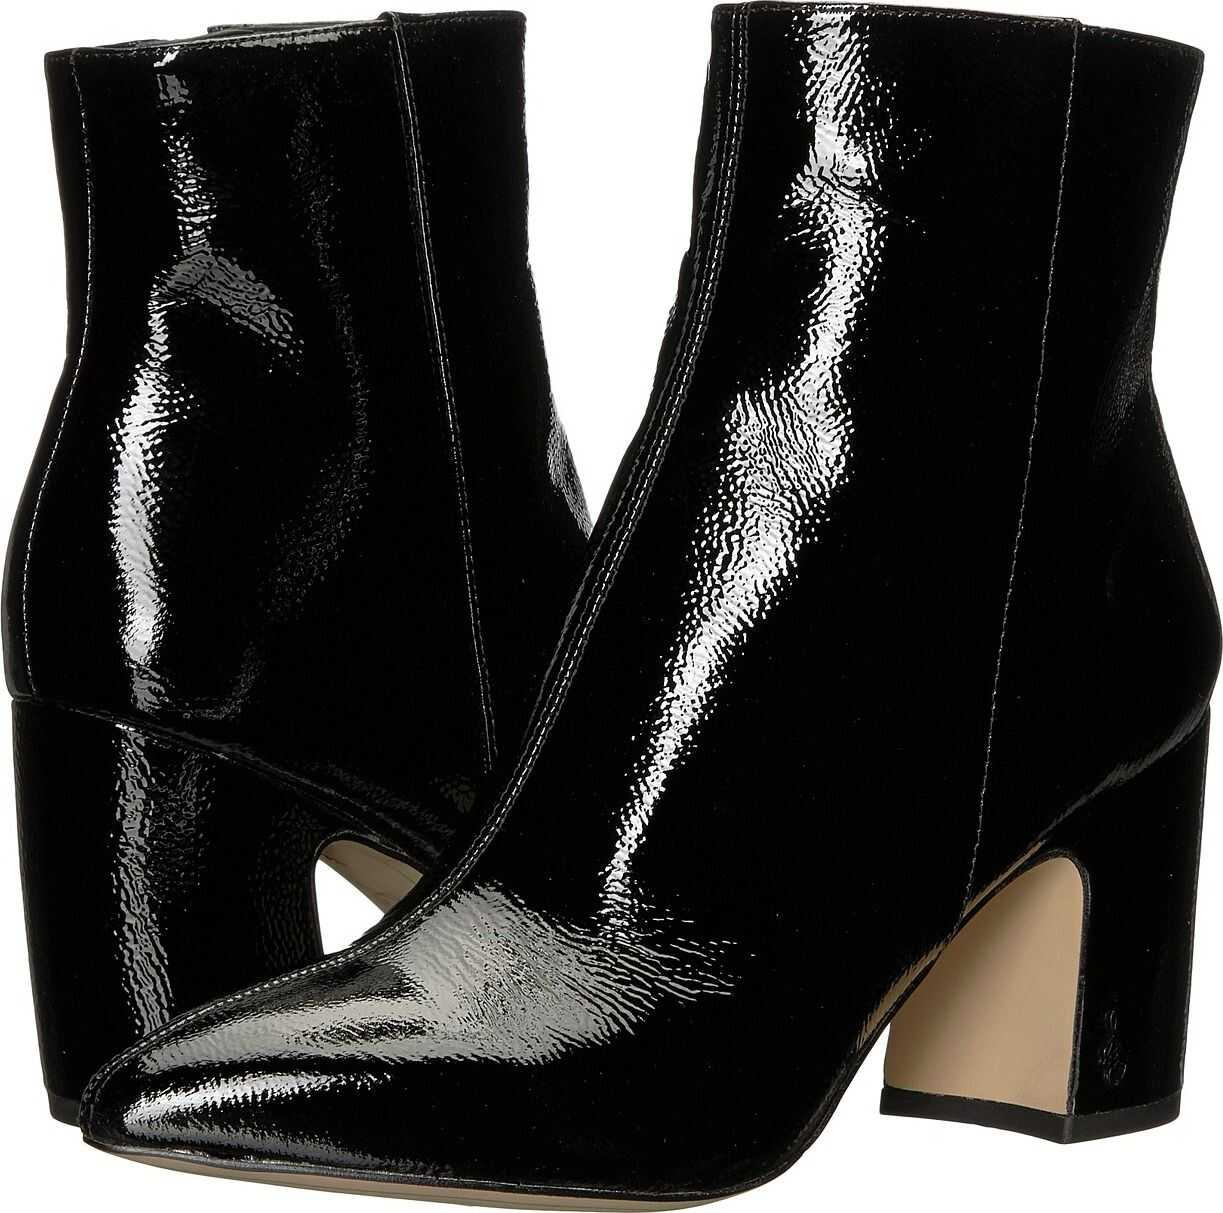 Sam Edelman Hilty 2 Black Goat Crinkle Patent Leather